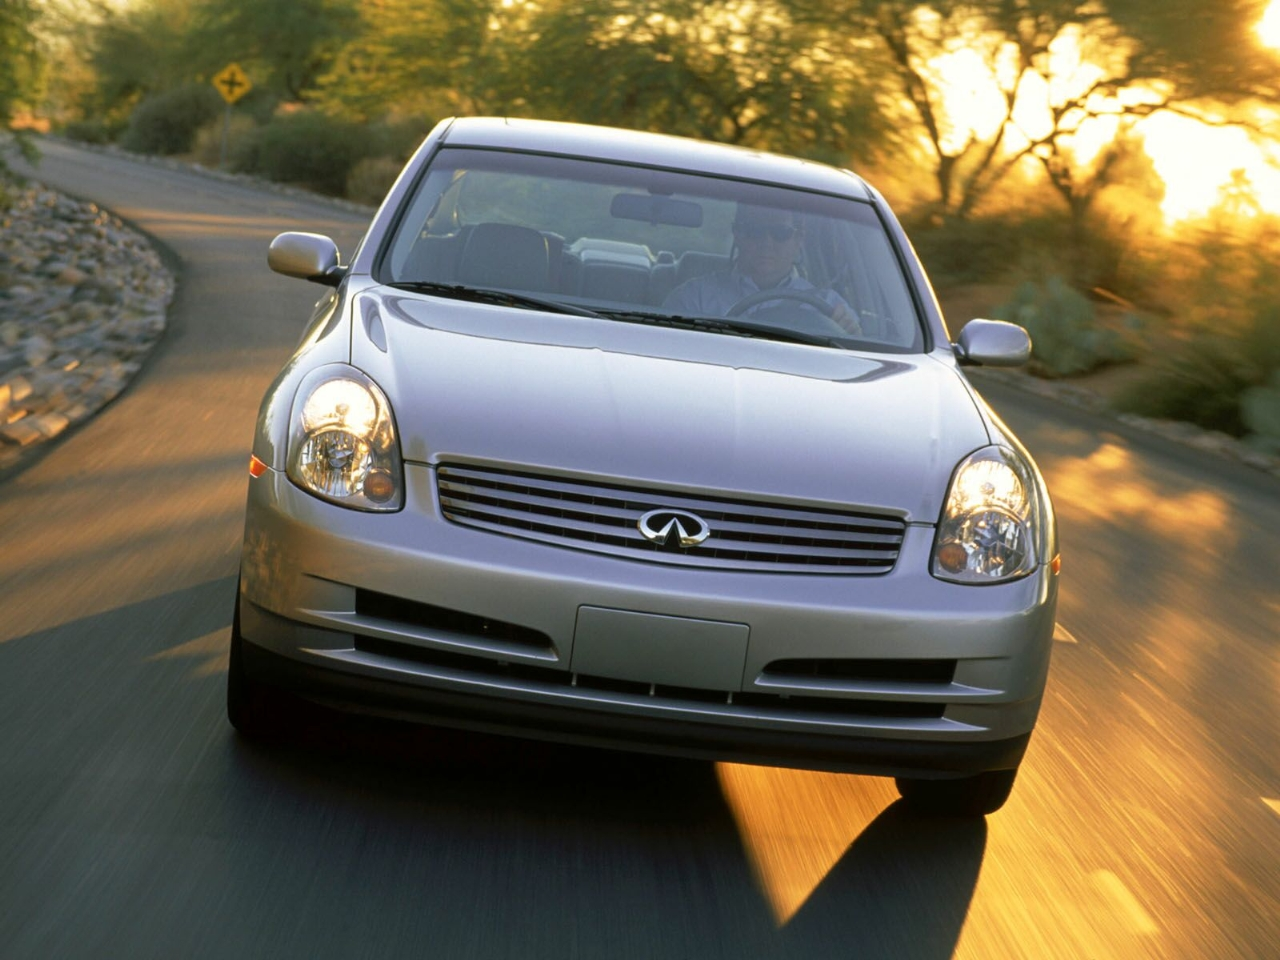 2006 Infiniti G Sedan Image